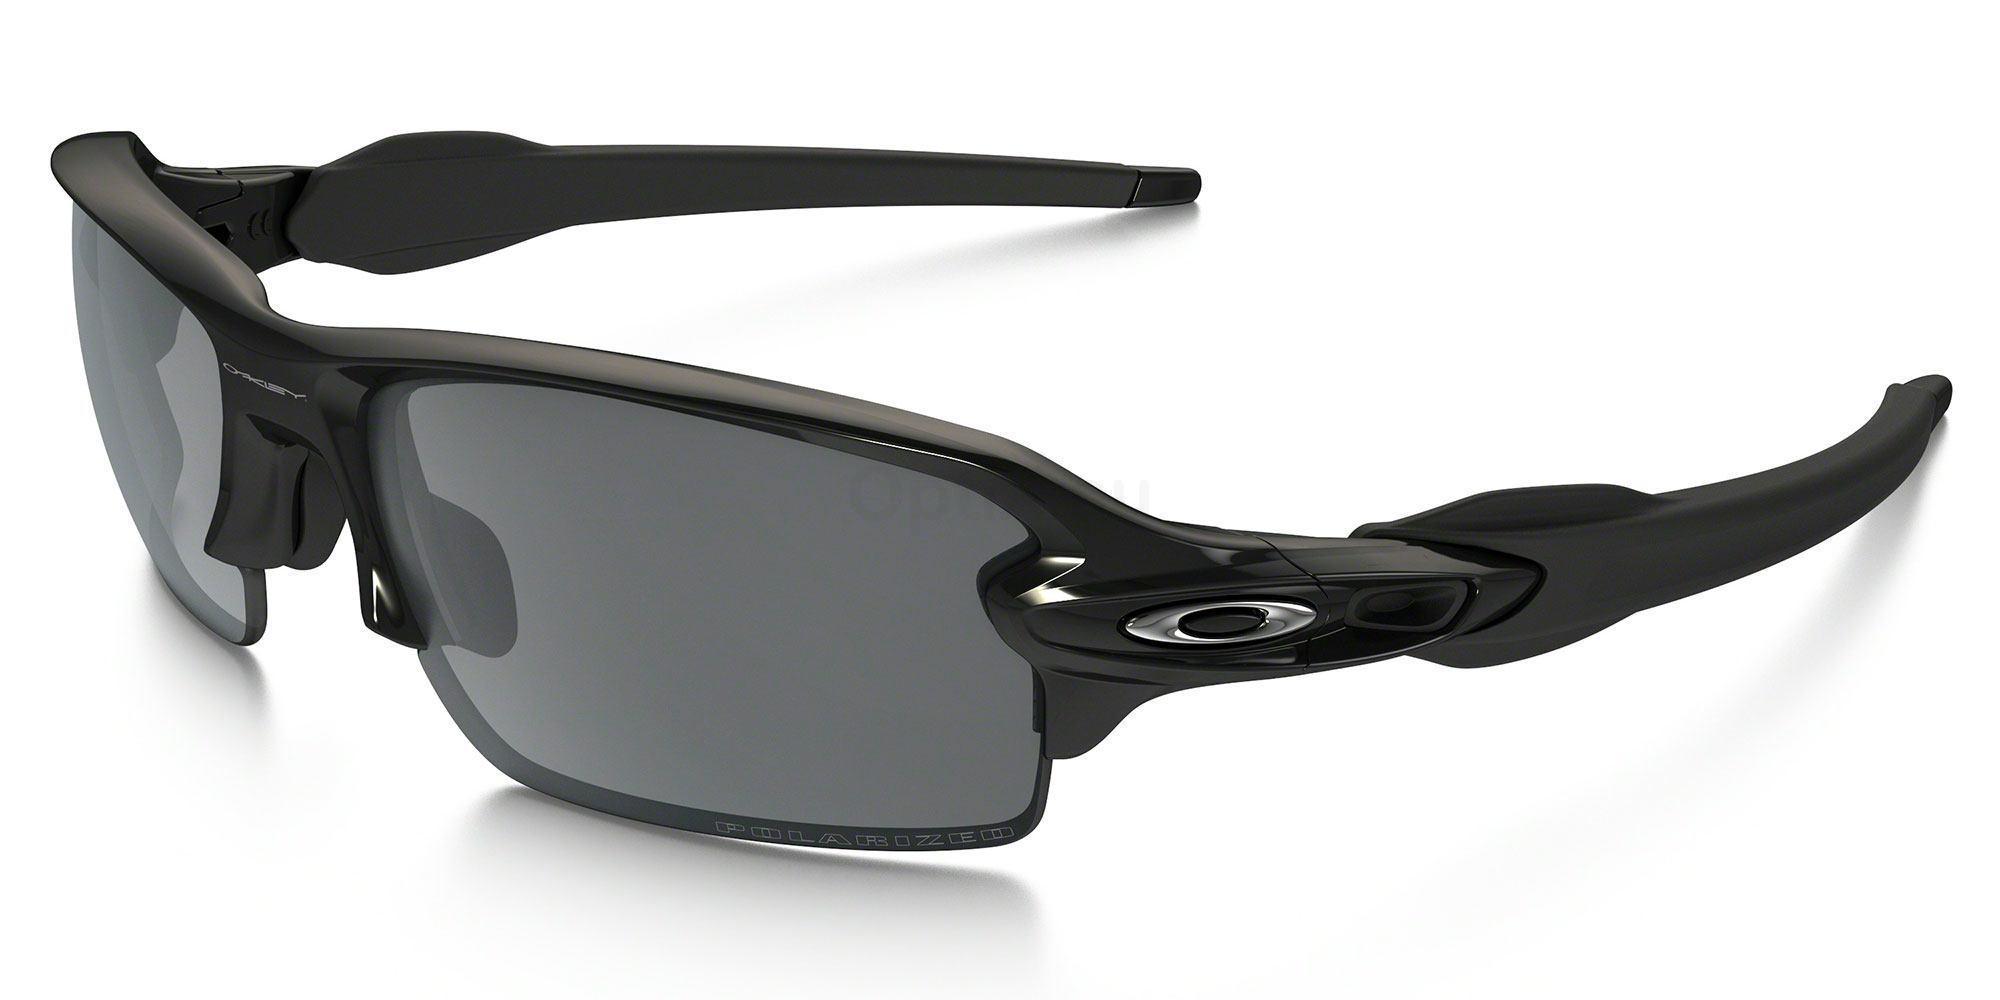 929507 OO9295 FLAK 2.0 POLARIZED Sunglasses, Oakley